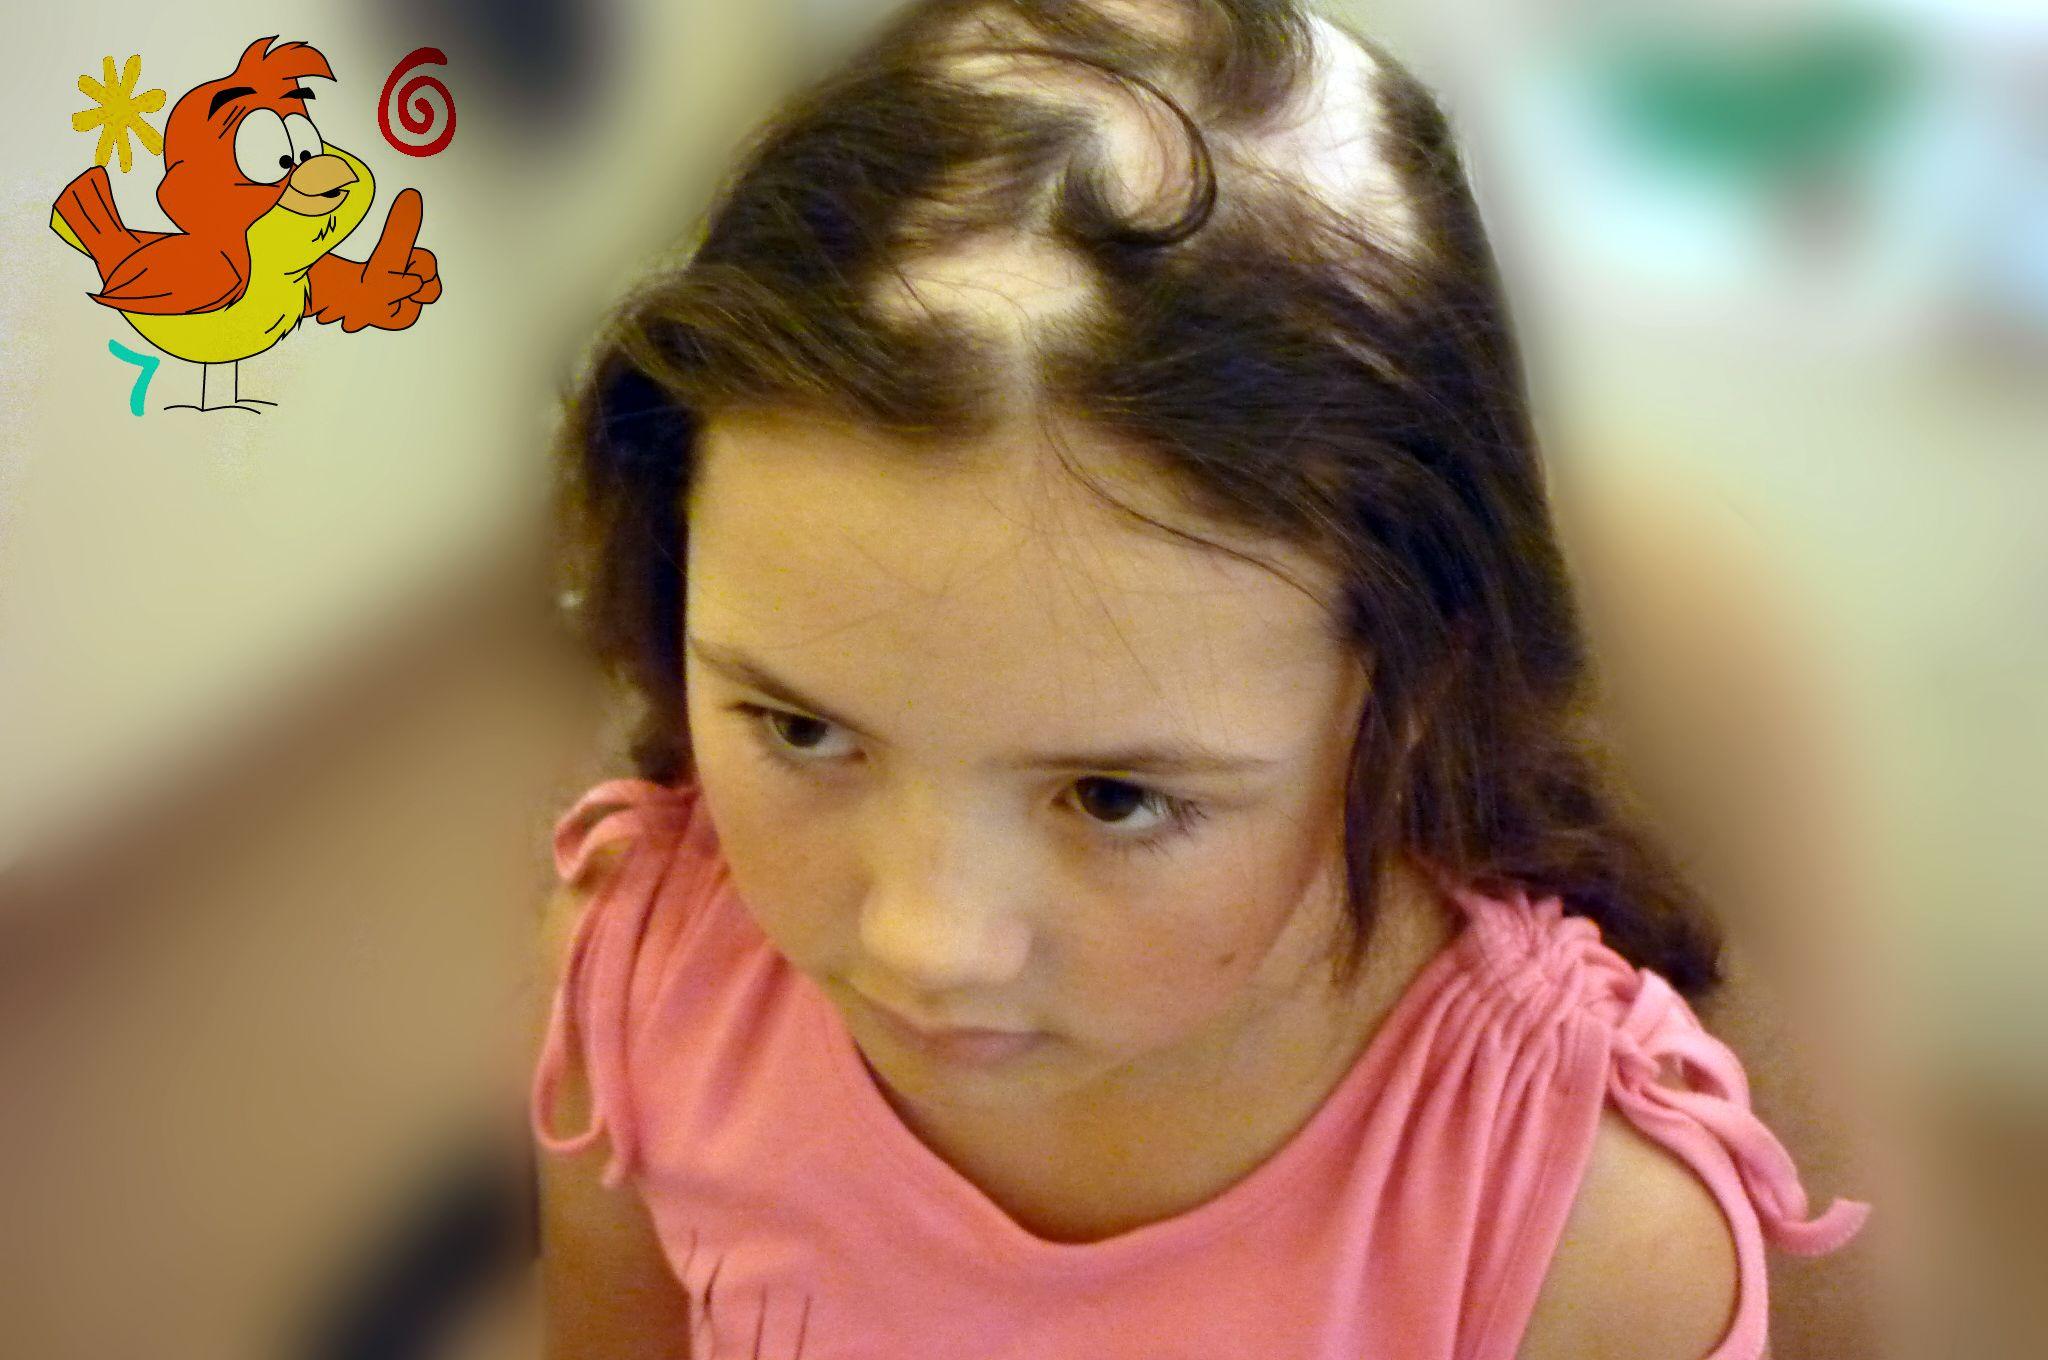 Pin on Children Hair Loss, Alopecia Areata, Alopecia ...